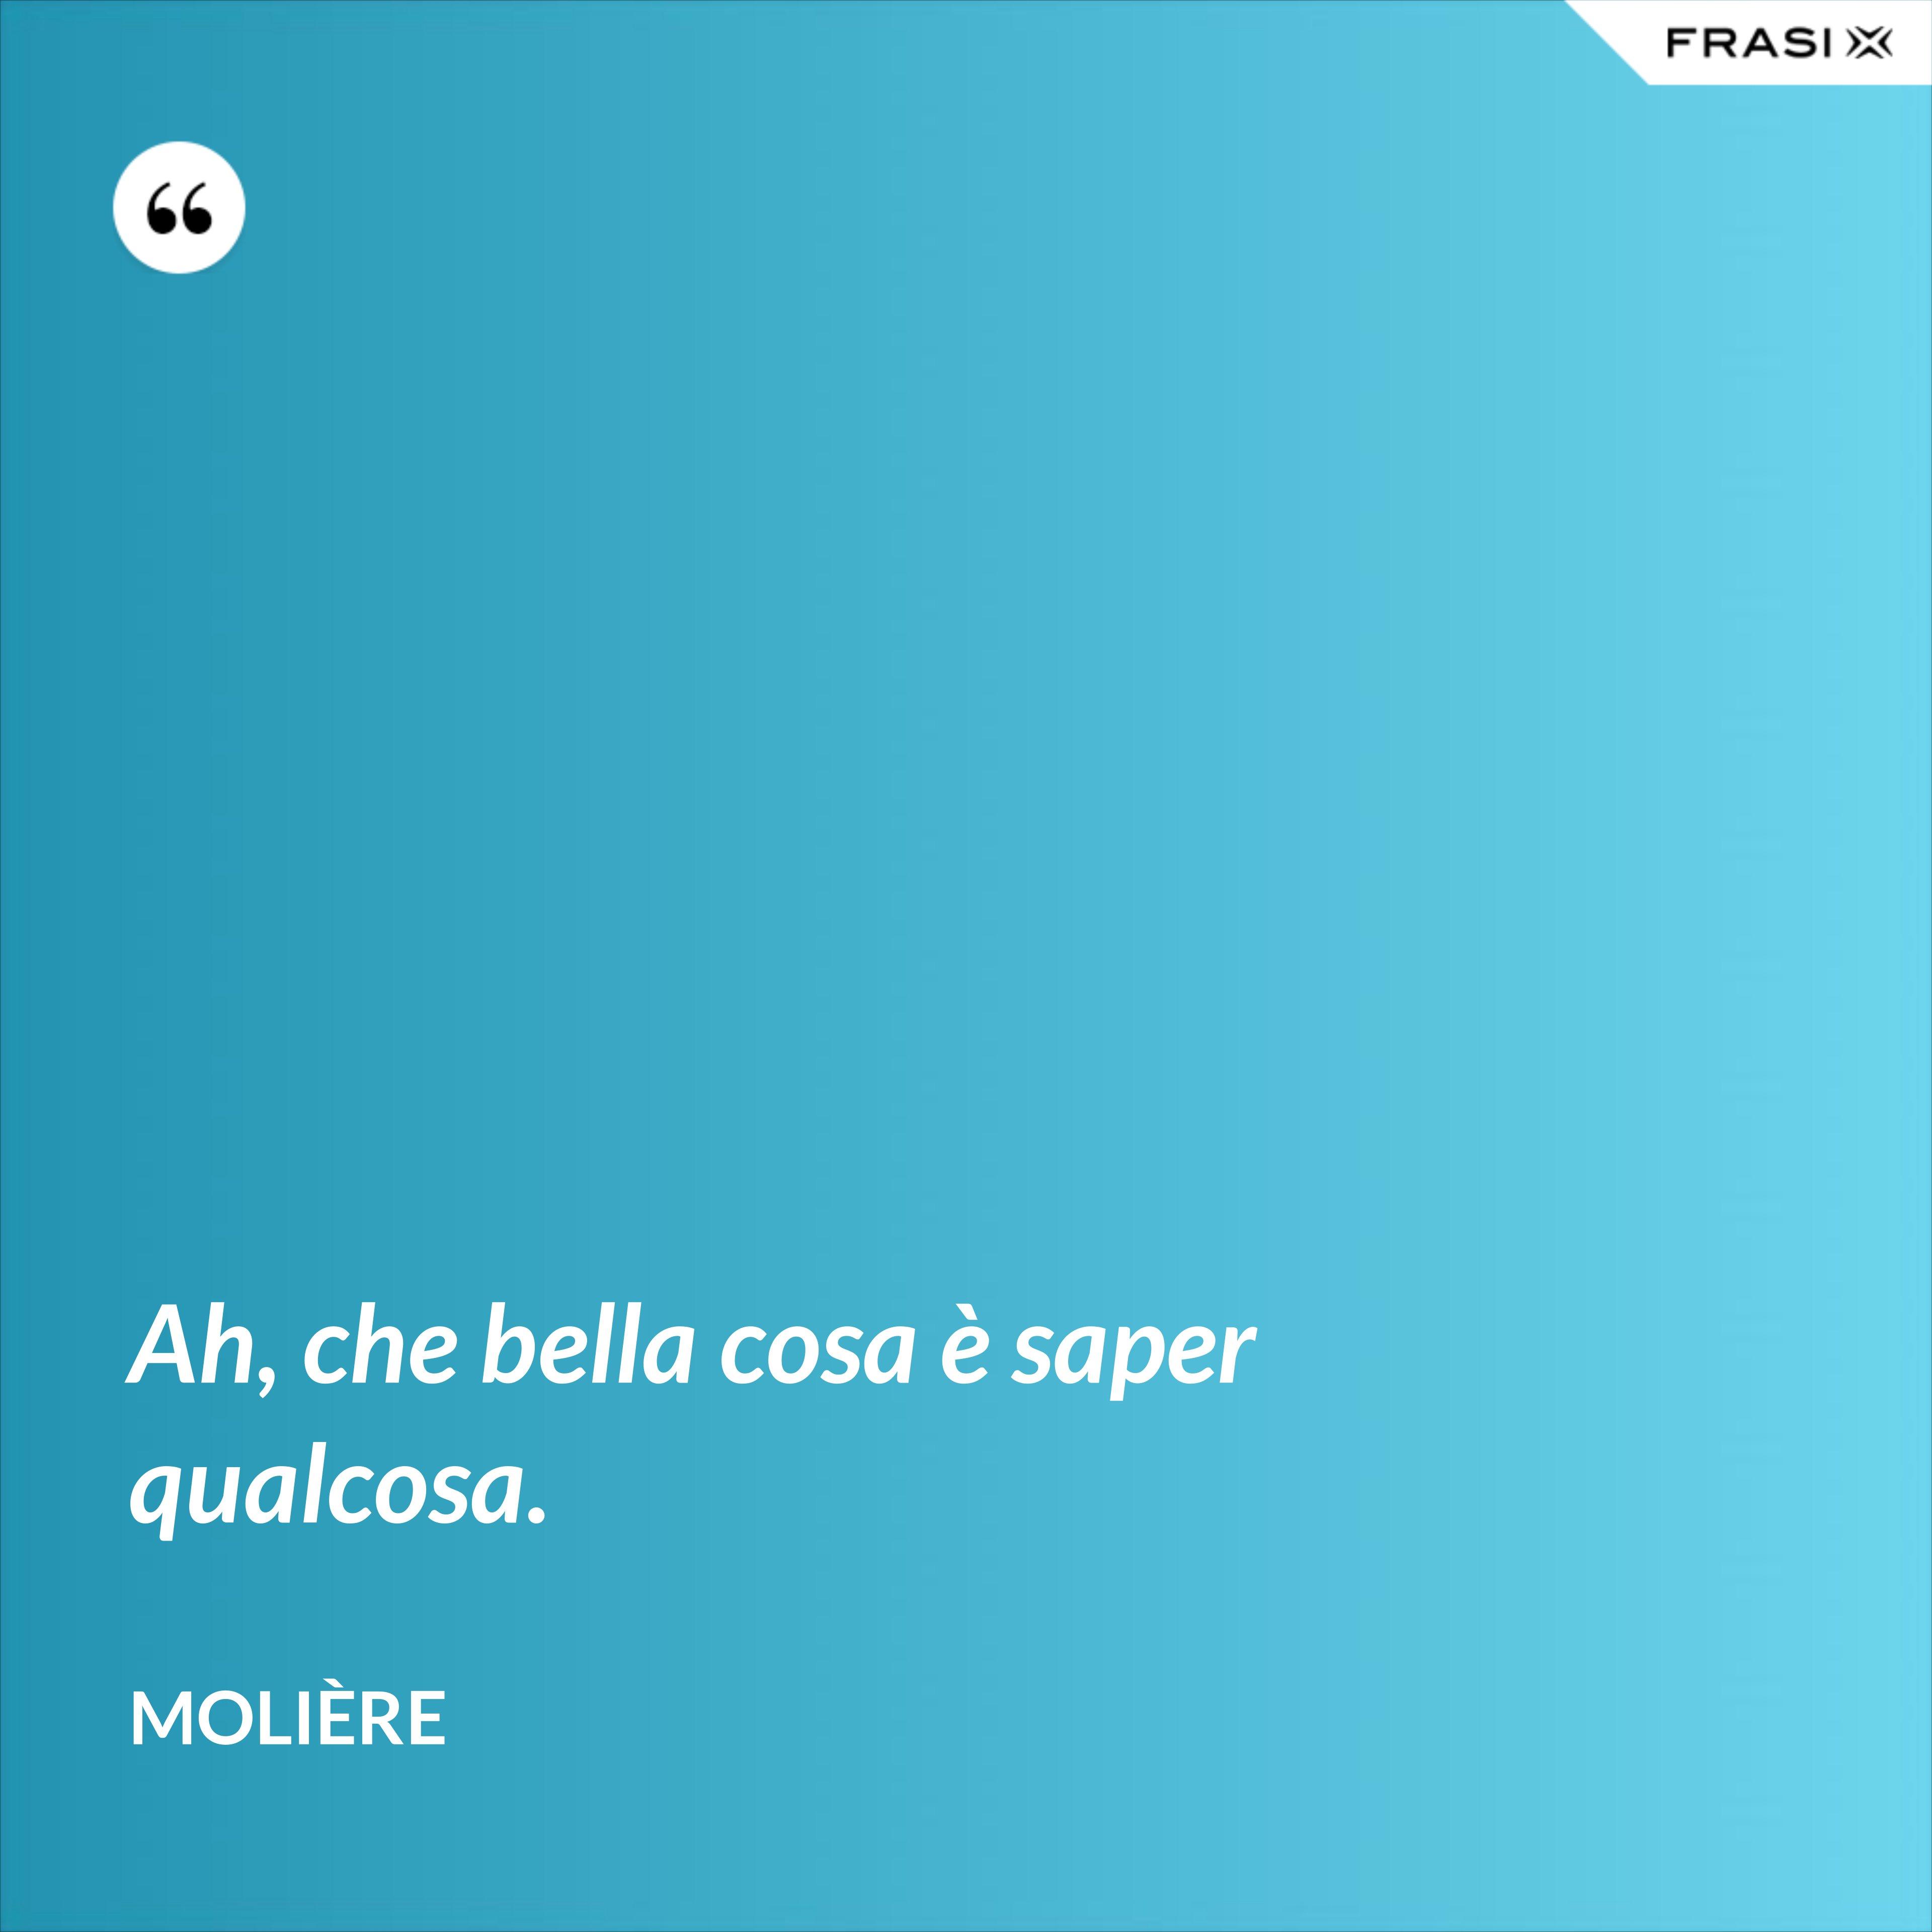 Ah, che bella cosa è saper qualcosa. - Molière